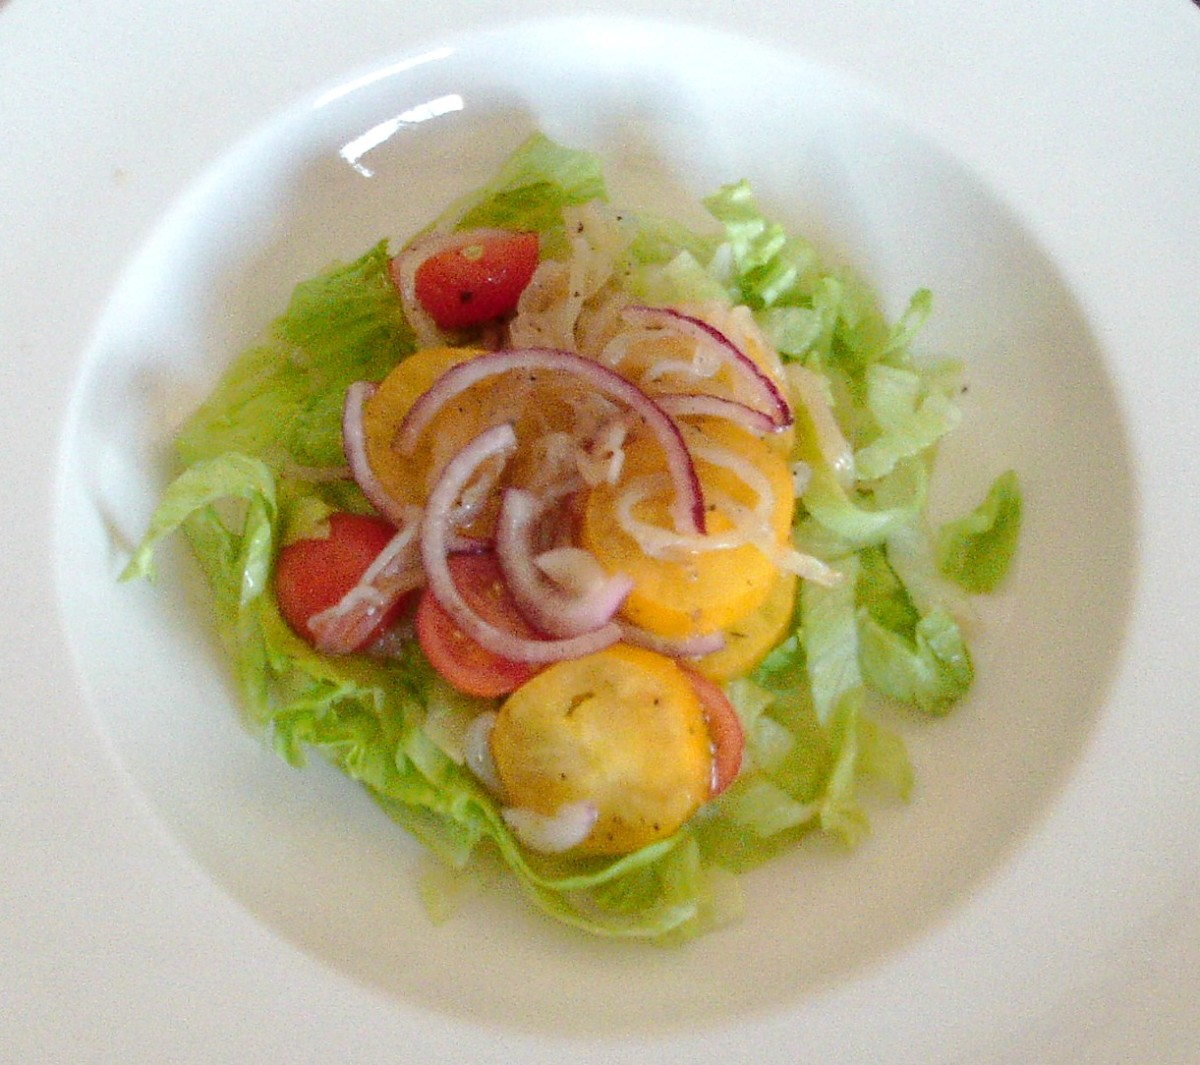 Jellyfish salad on shredded lettuce bed